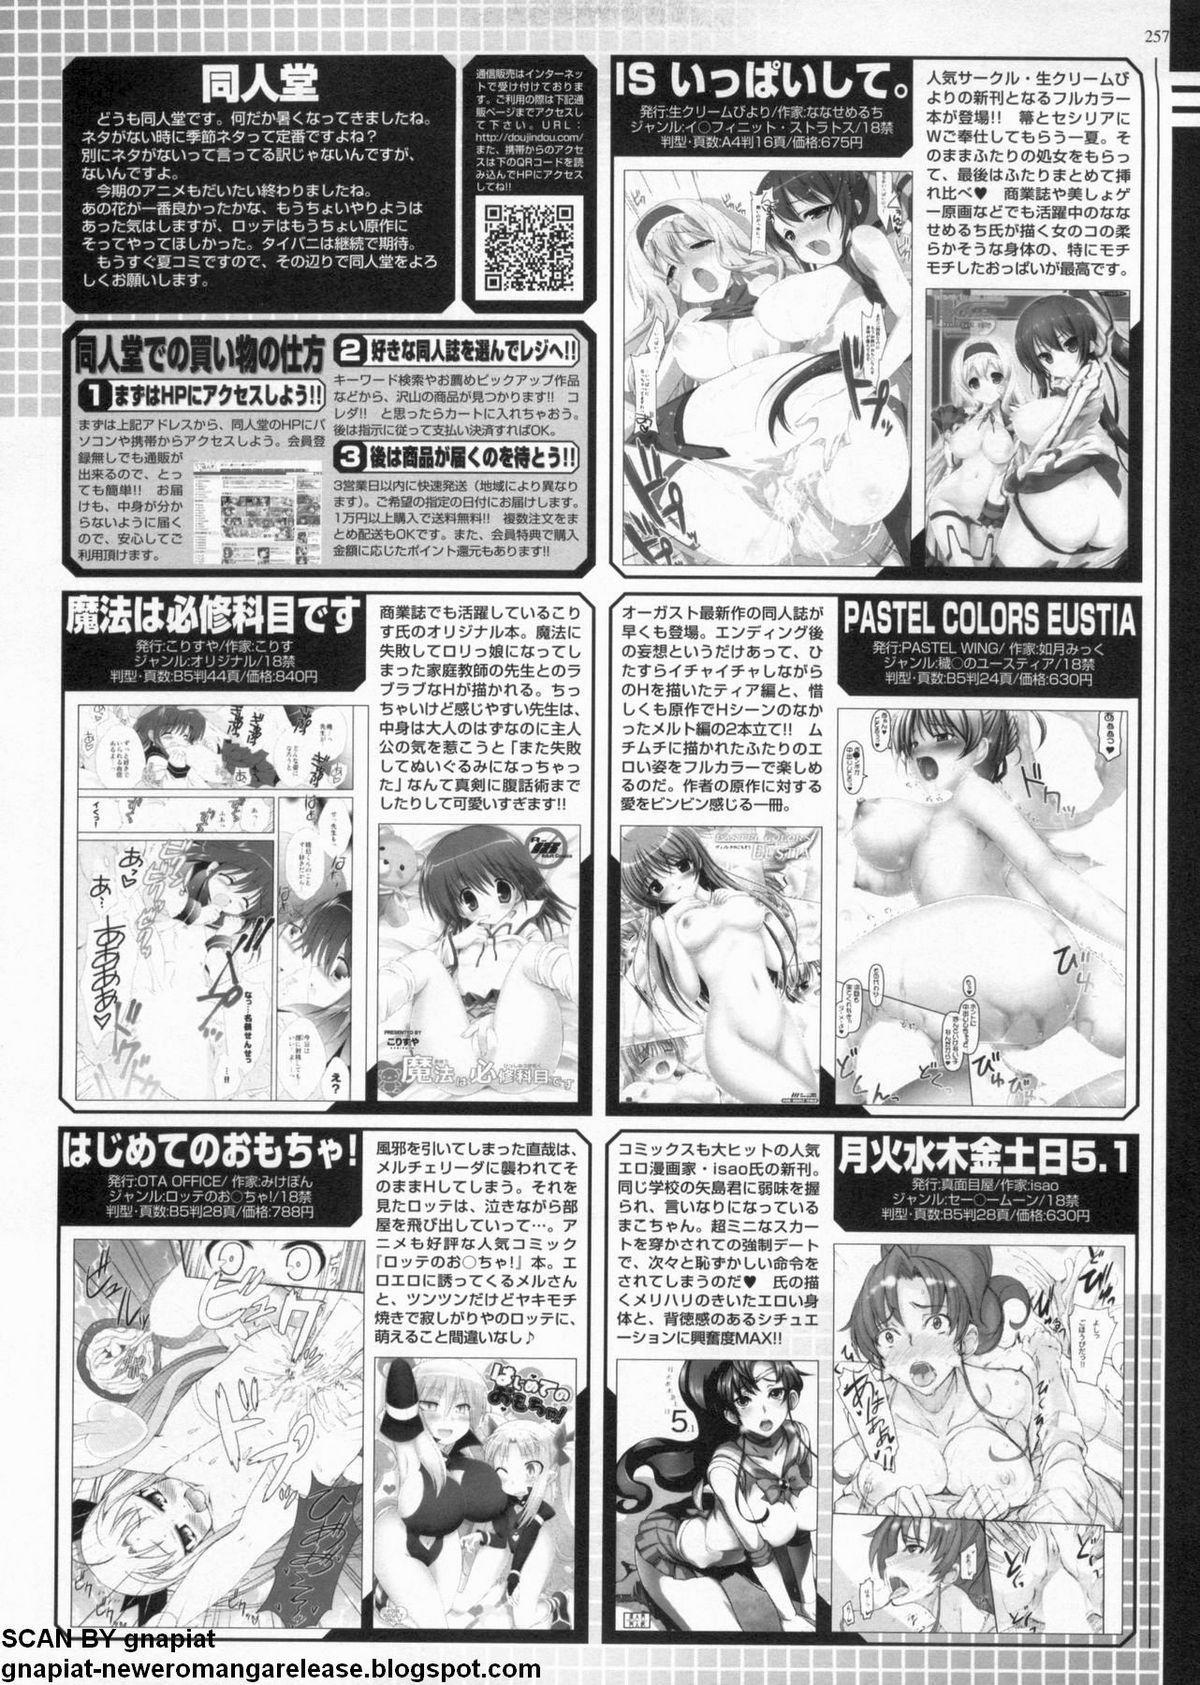 BugBug 2011-08 Vol. 204 254